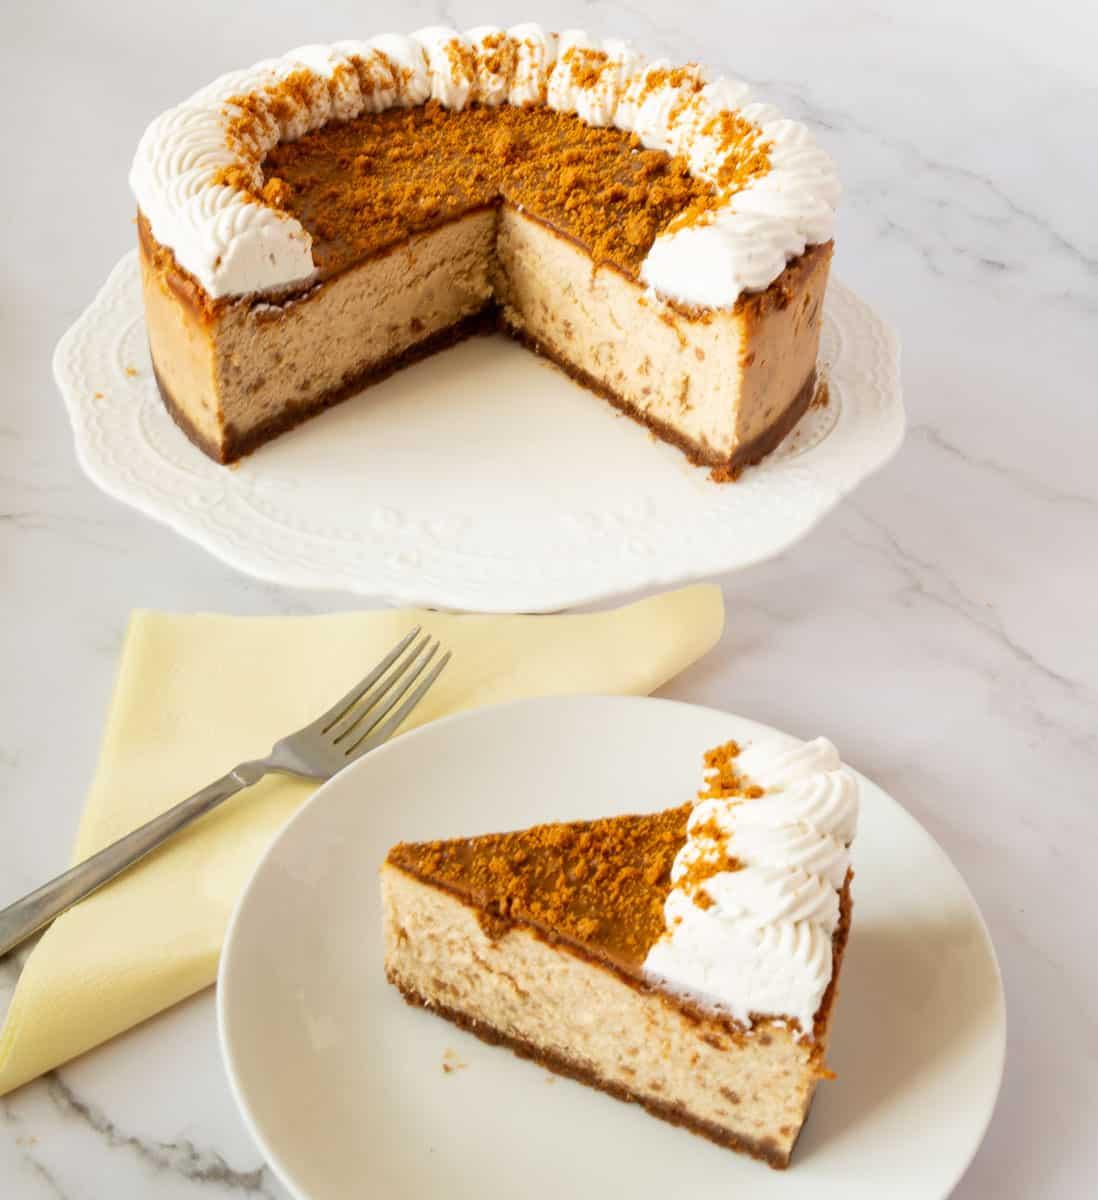 A sliced cheesecake with bsicoff glaze.